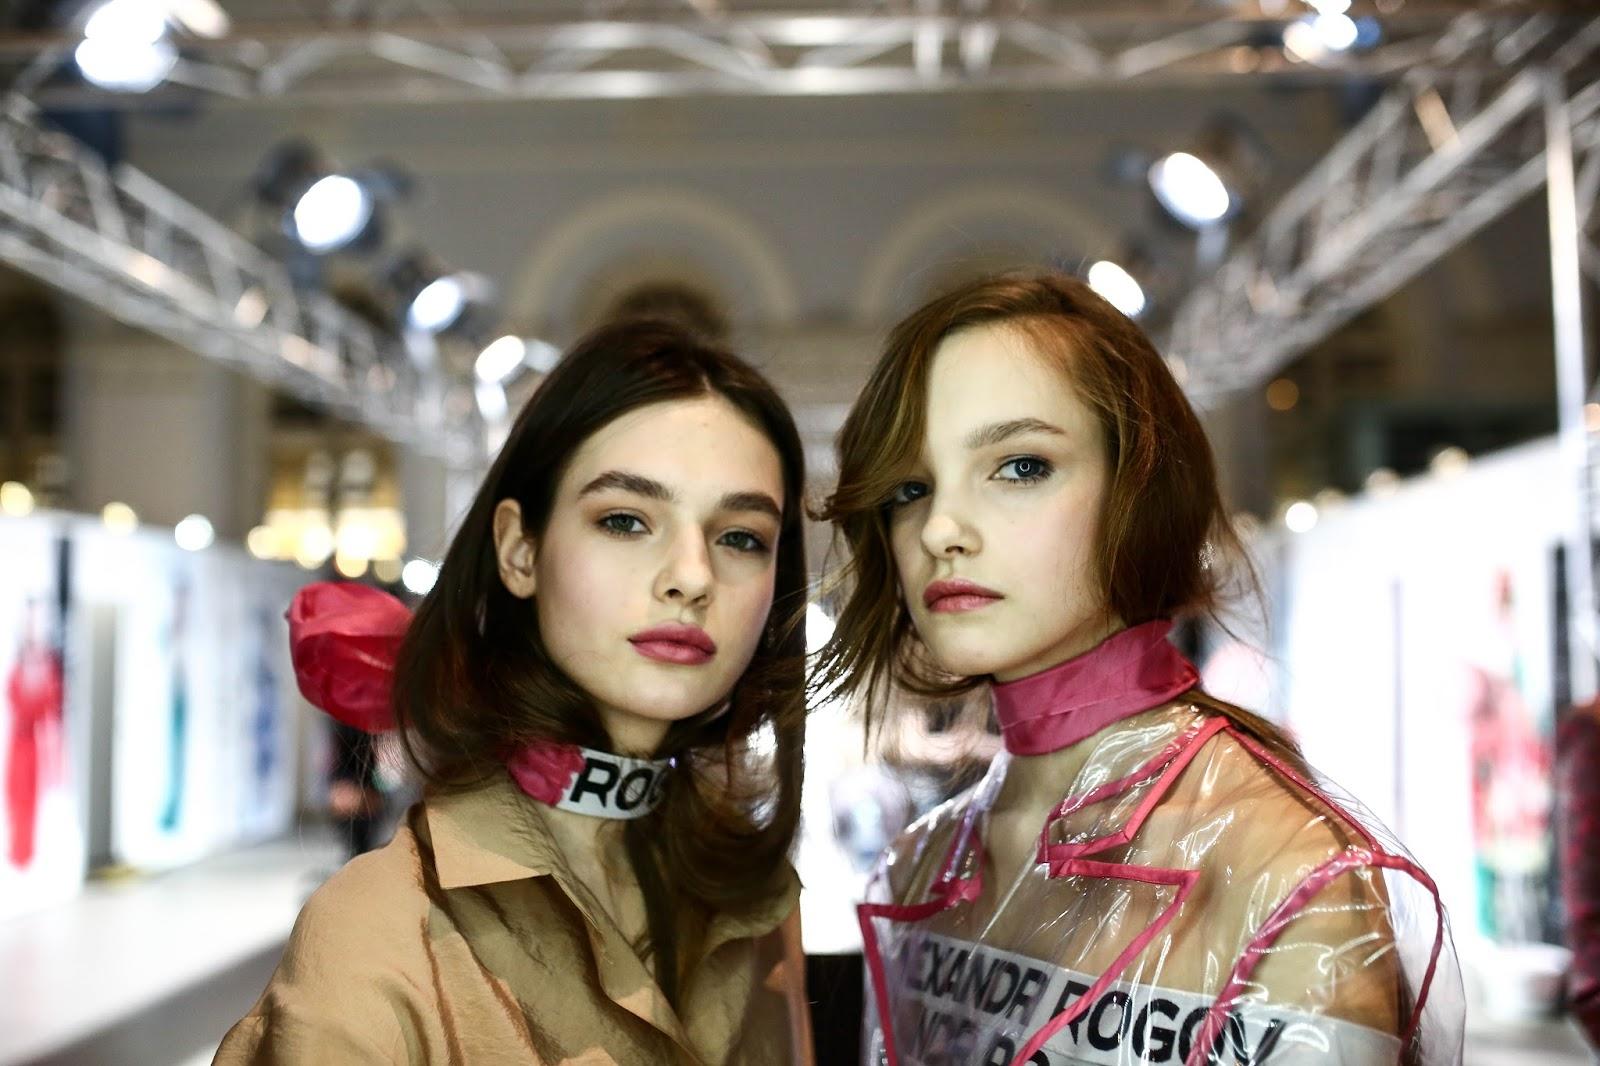 Followers discuss new hairstyle of Yulia Baranovskaya 14.06.2018 76